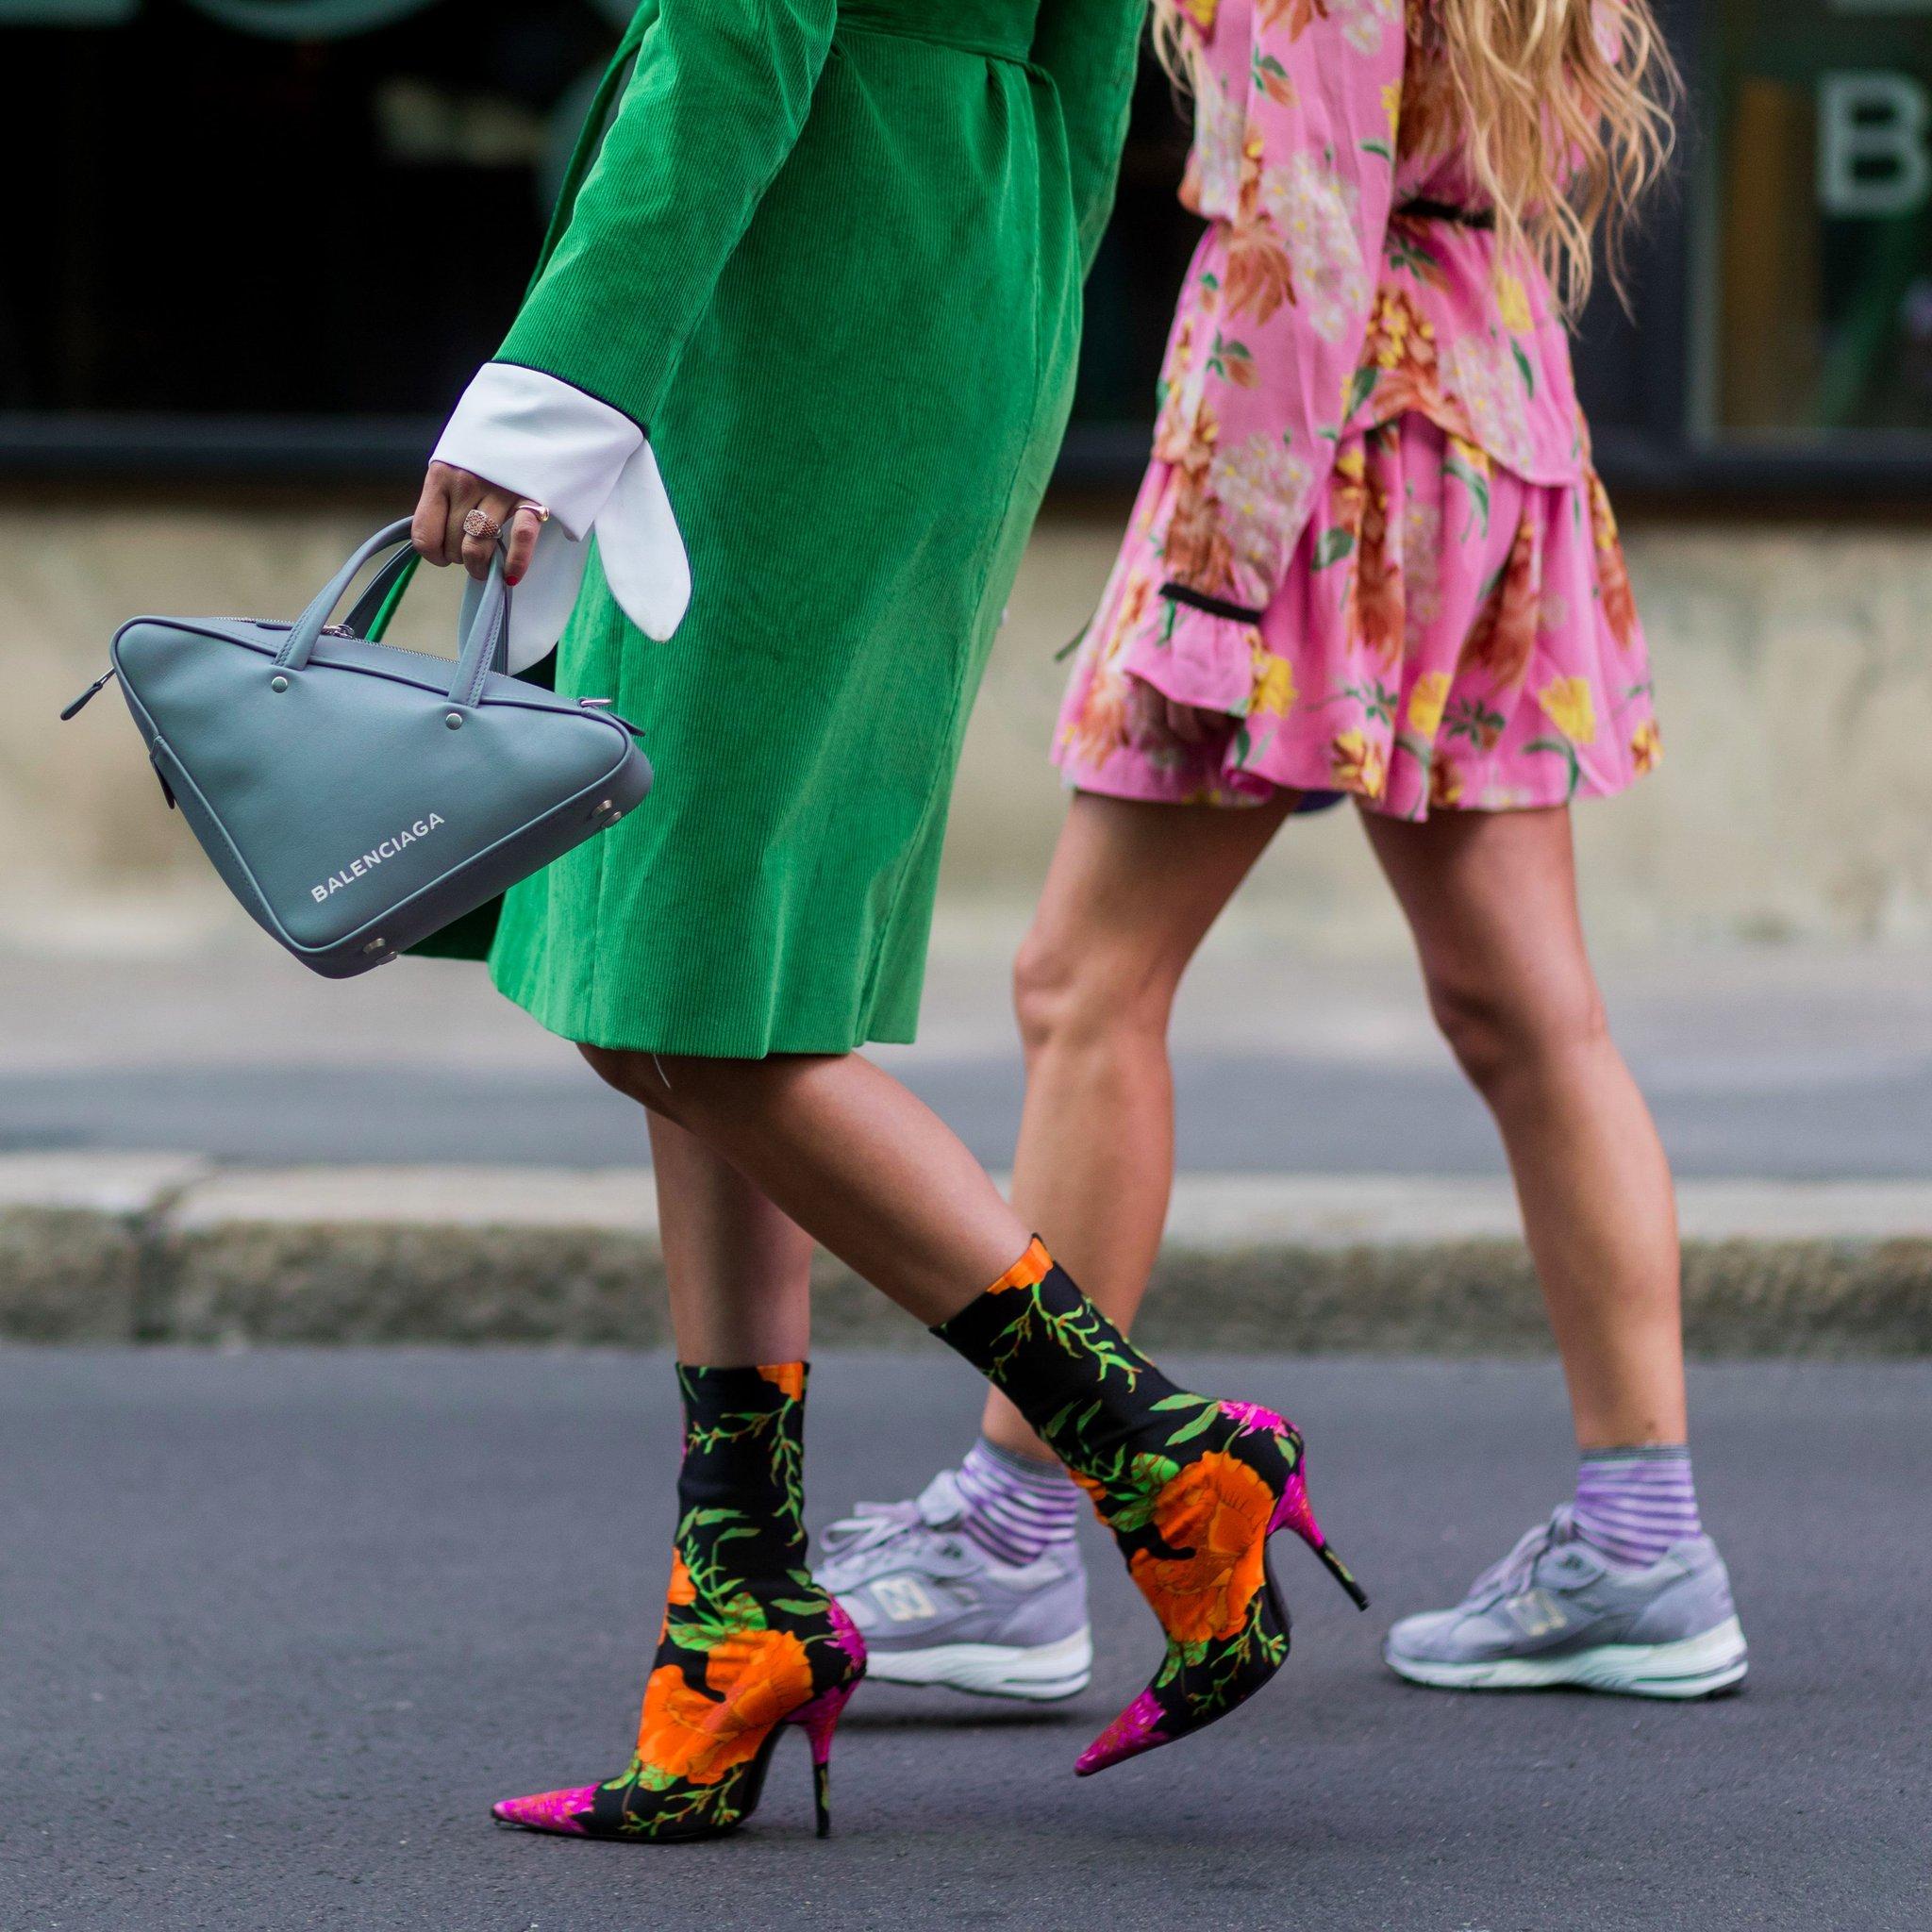 Balenciaga-Triangle-Bag-Trend.jpg